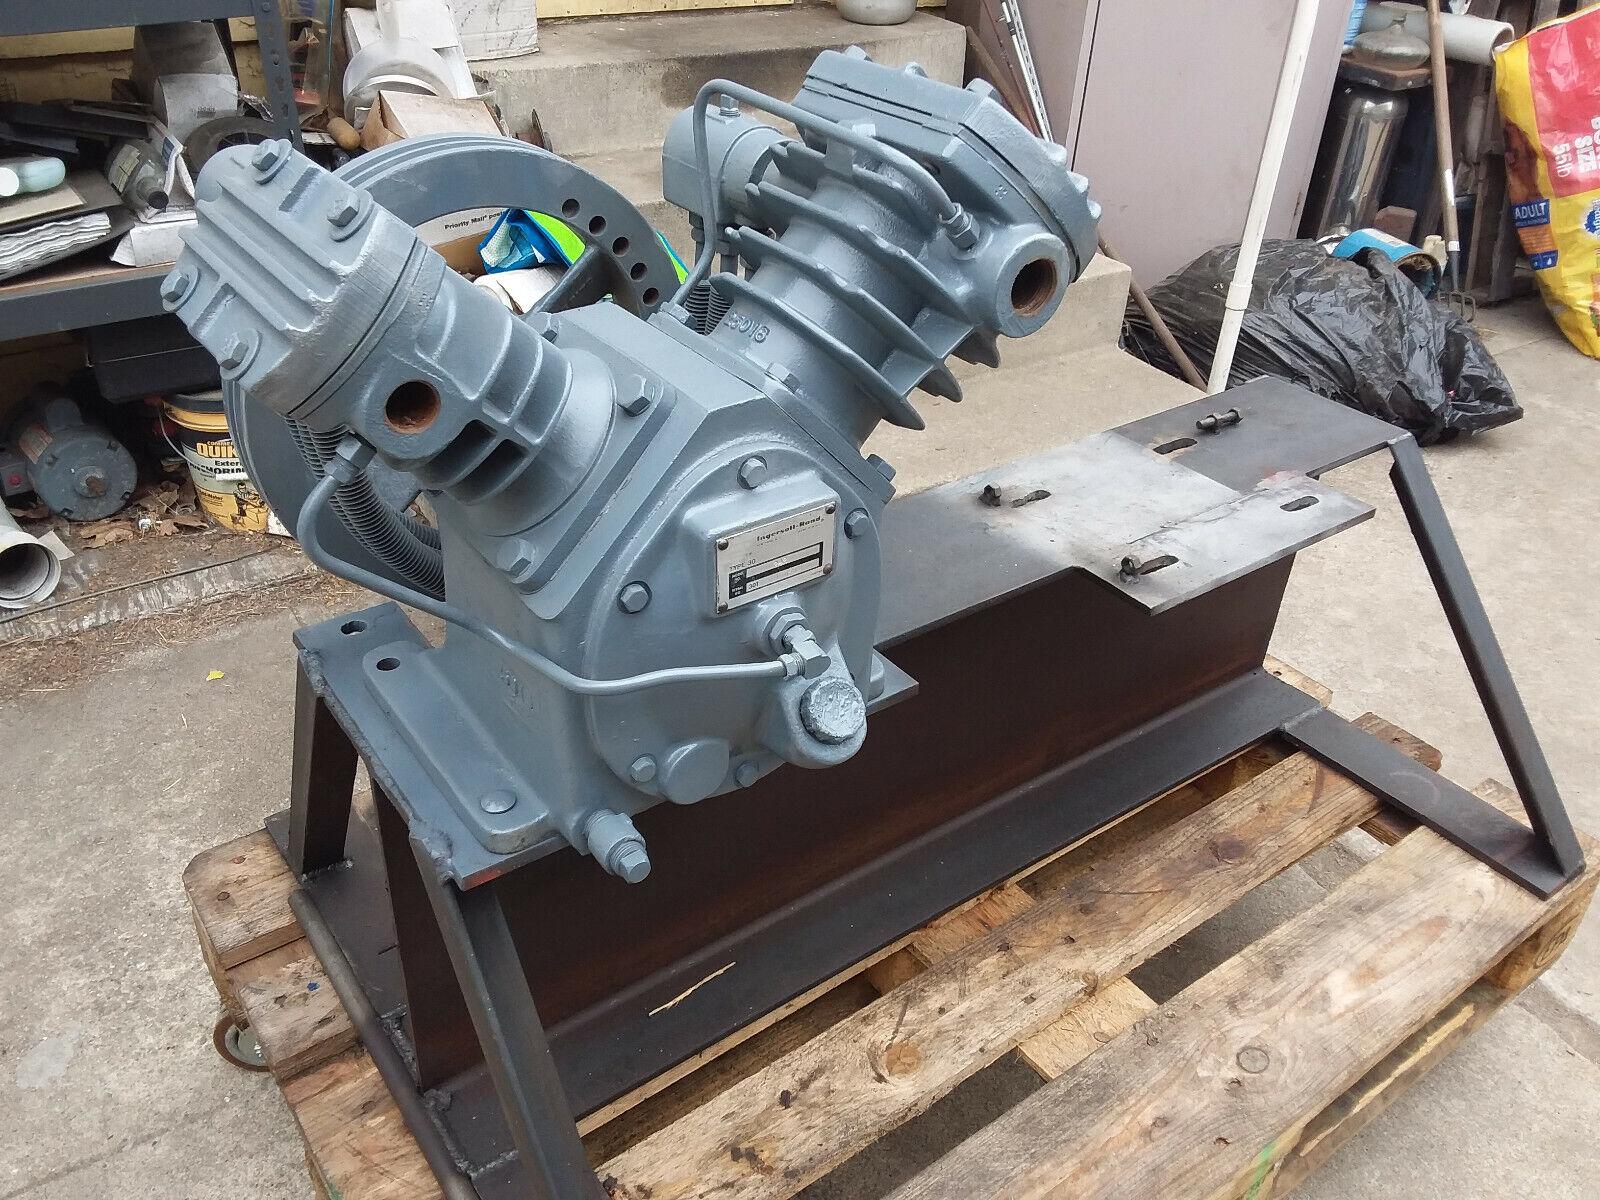 New Ingersoll Rand Air Compressor Pump 242 T30 30T in Los An